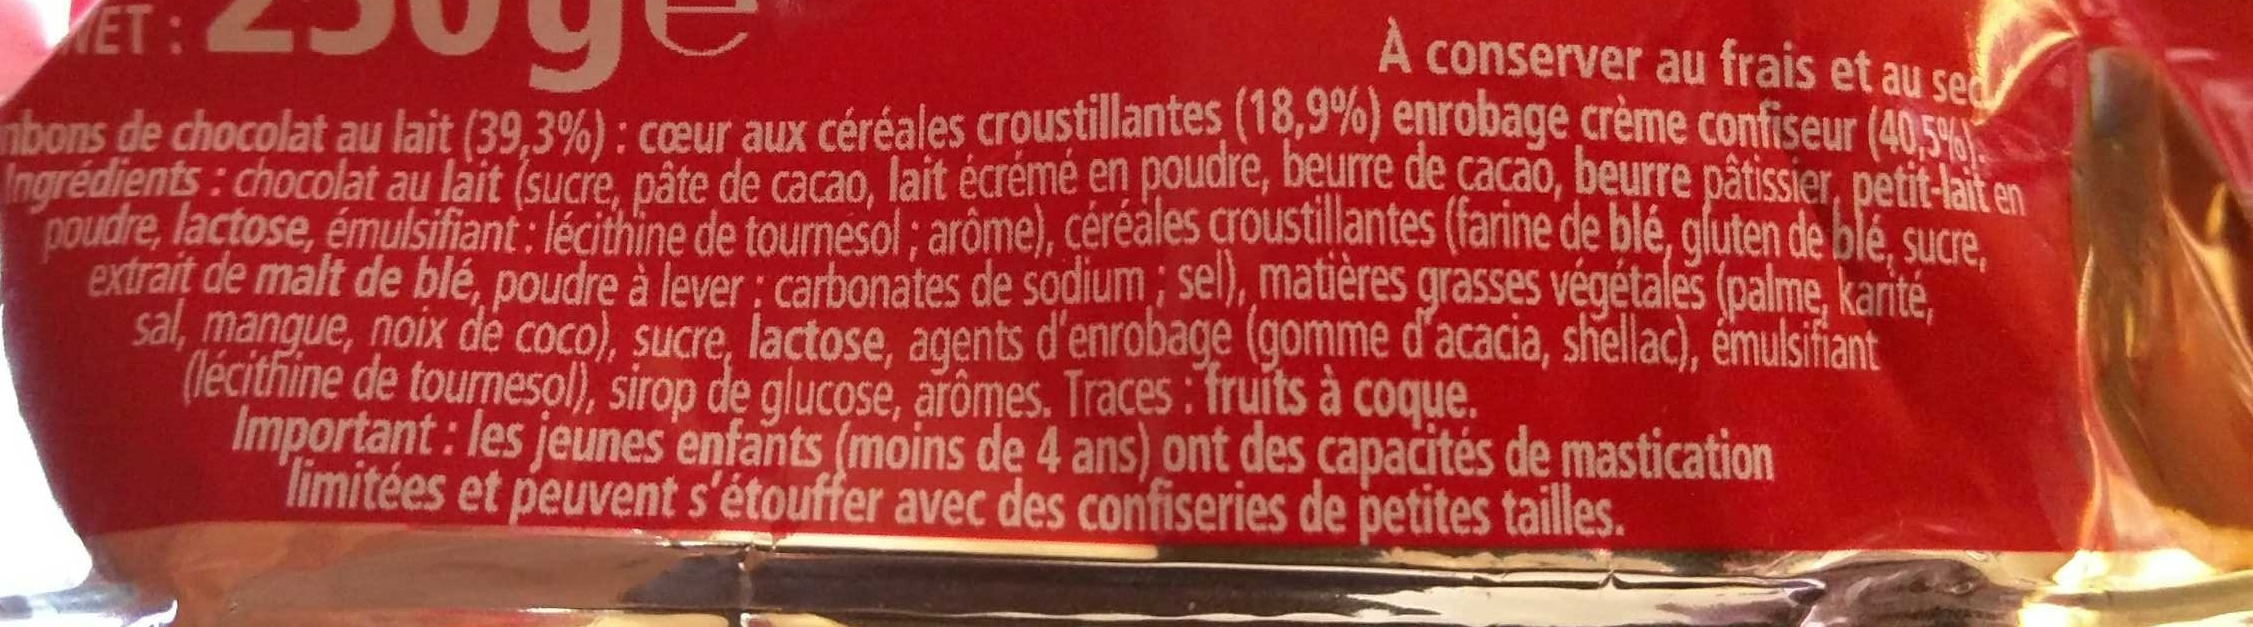 KitKat Ball - Ingrédients - fr